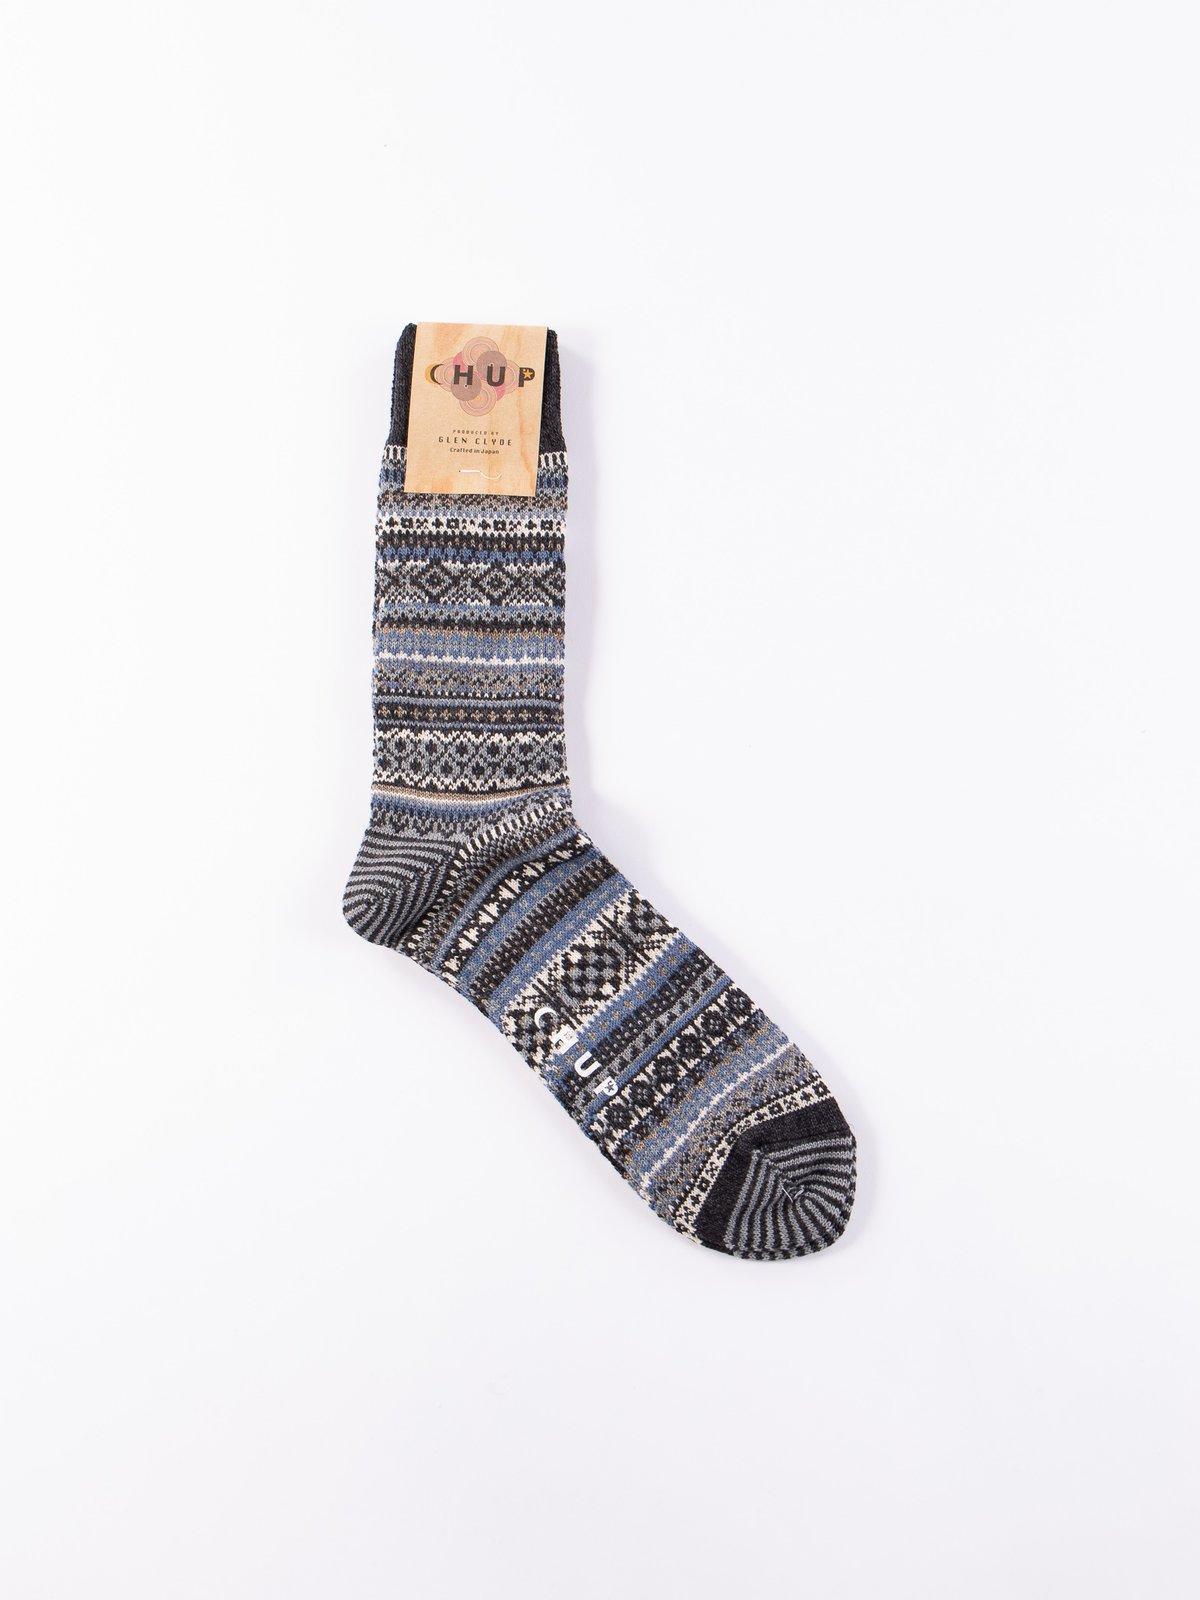 Charcoal Baile Socks - Image 1